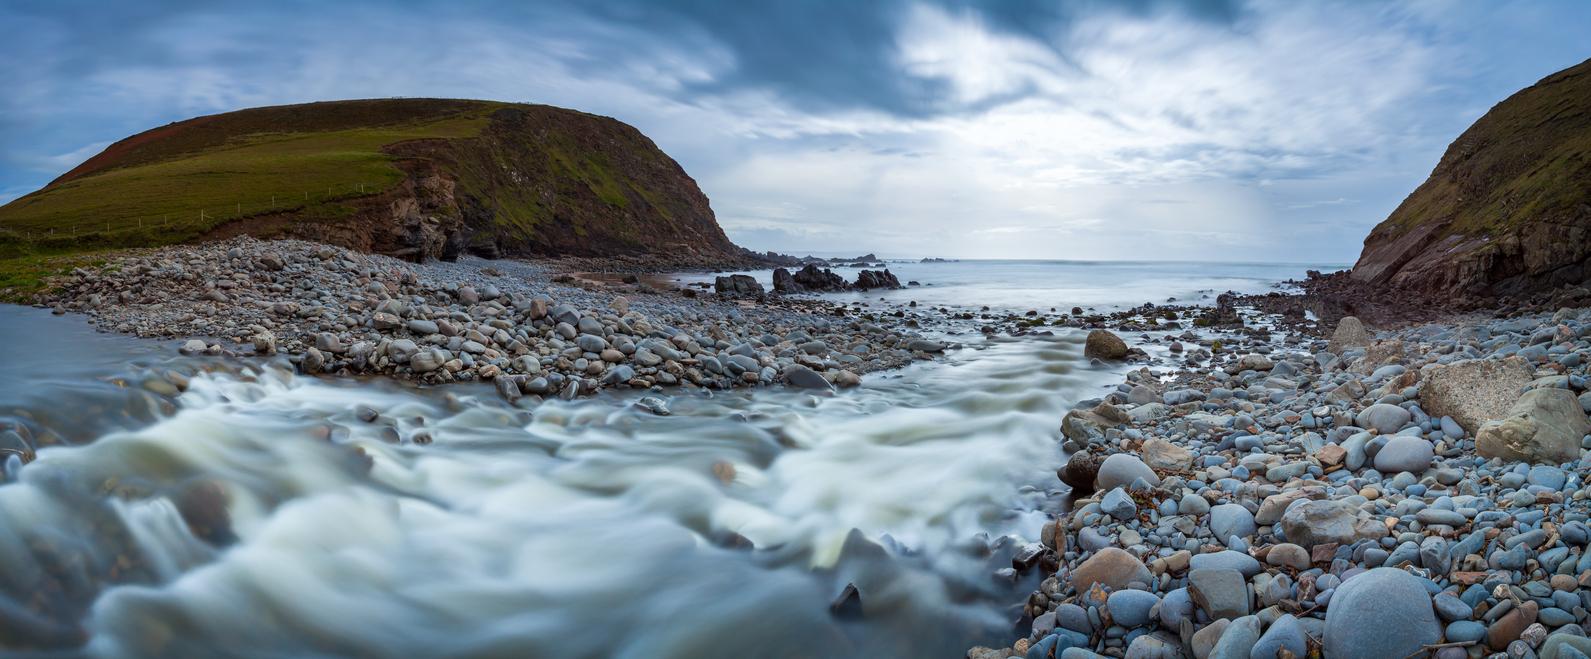 Duckpool Beach Cornwall South West England UK